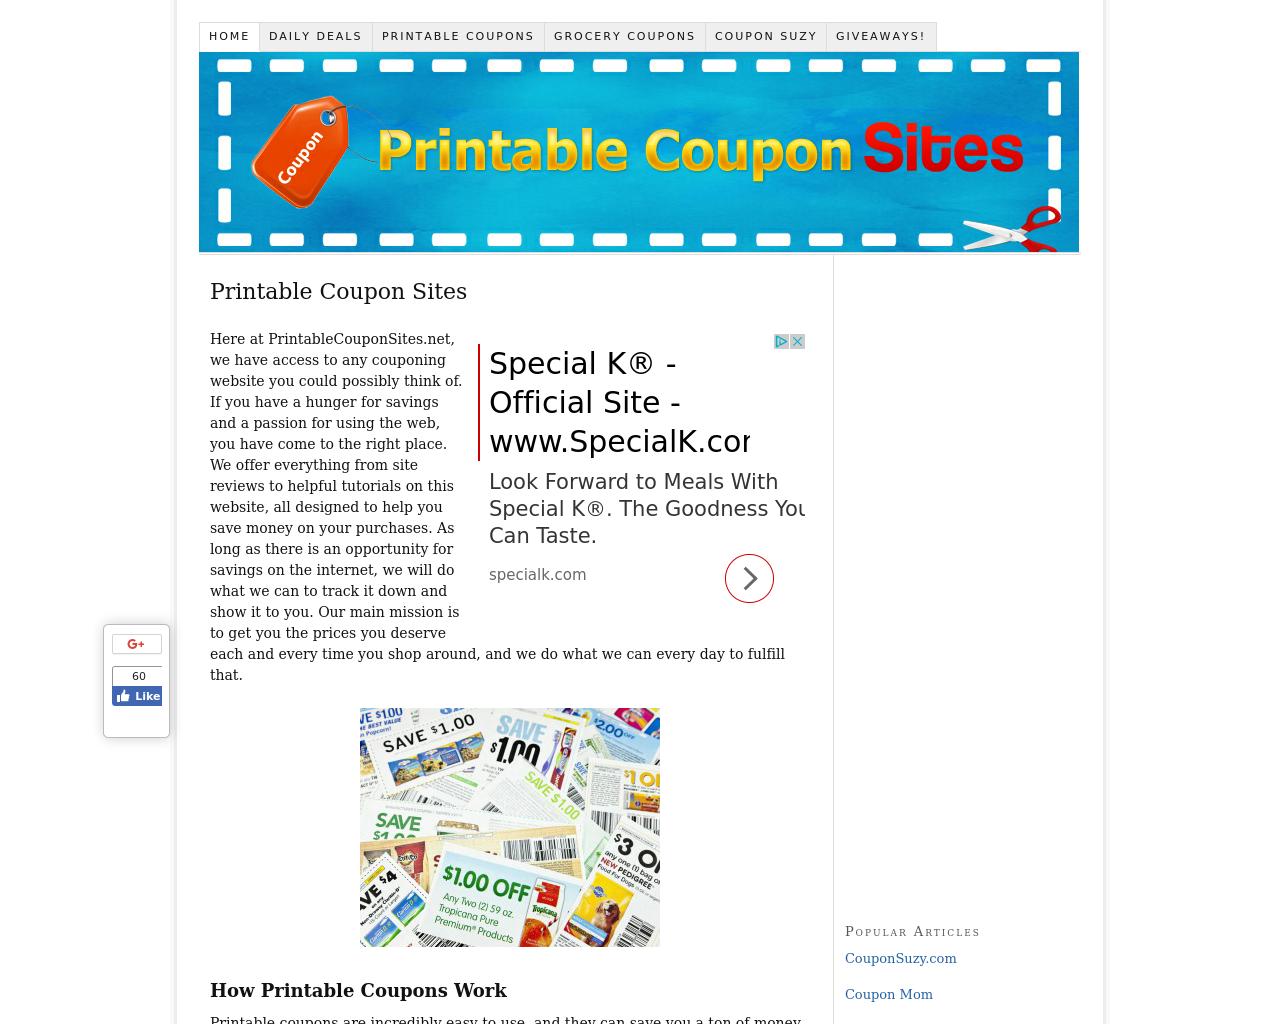 Printable-Coupon-Sites-Advertising-Reviews-Pricing